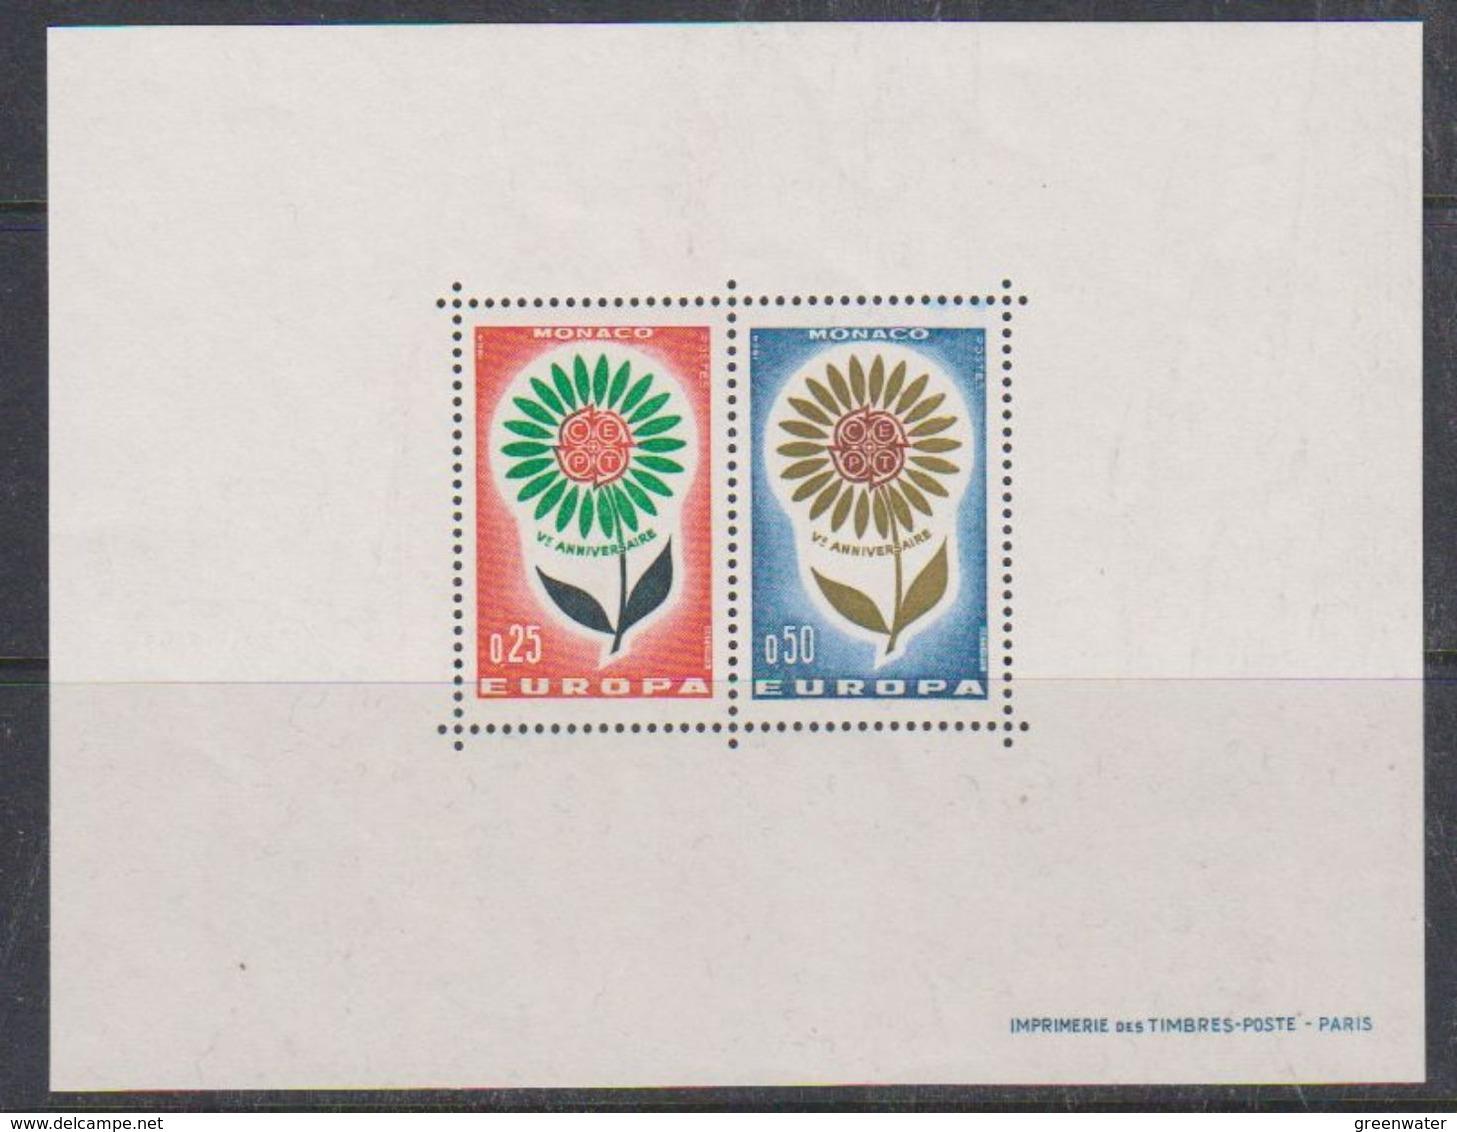 "Europa Cept 1964 Monaco M/s ""Sonderdruck"" Special Block ** Mnh (38149) - 1964"